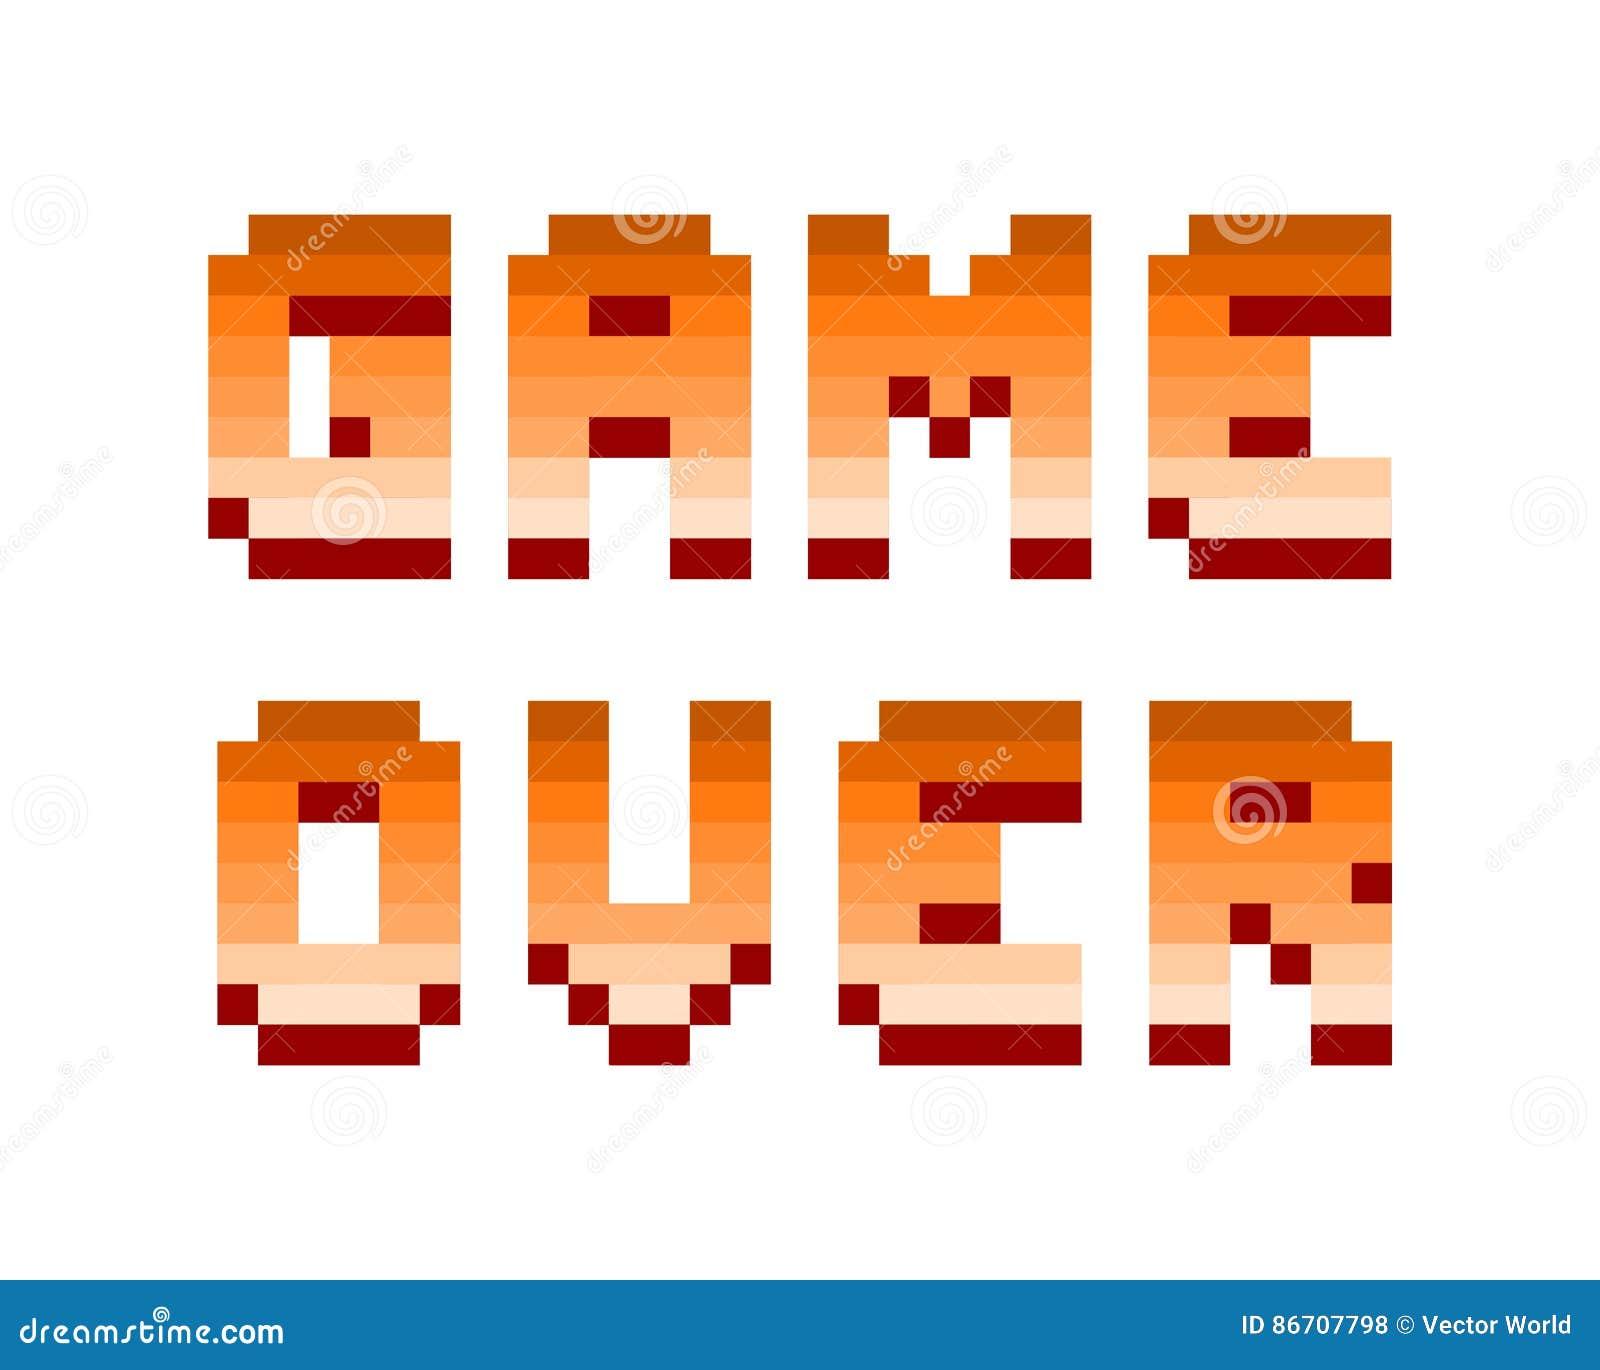 Pixel Retro Computer Game Over Text Design Vector Illustration Stock Vector Illustration Of Icon Symbol 86707798